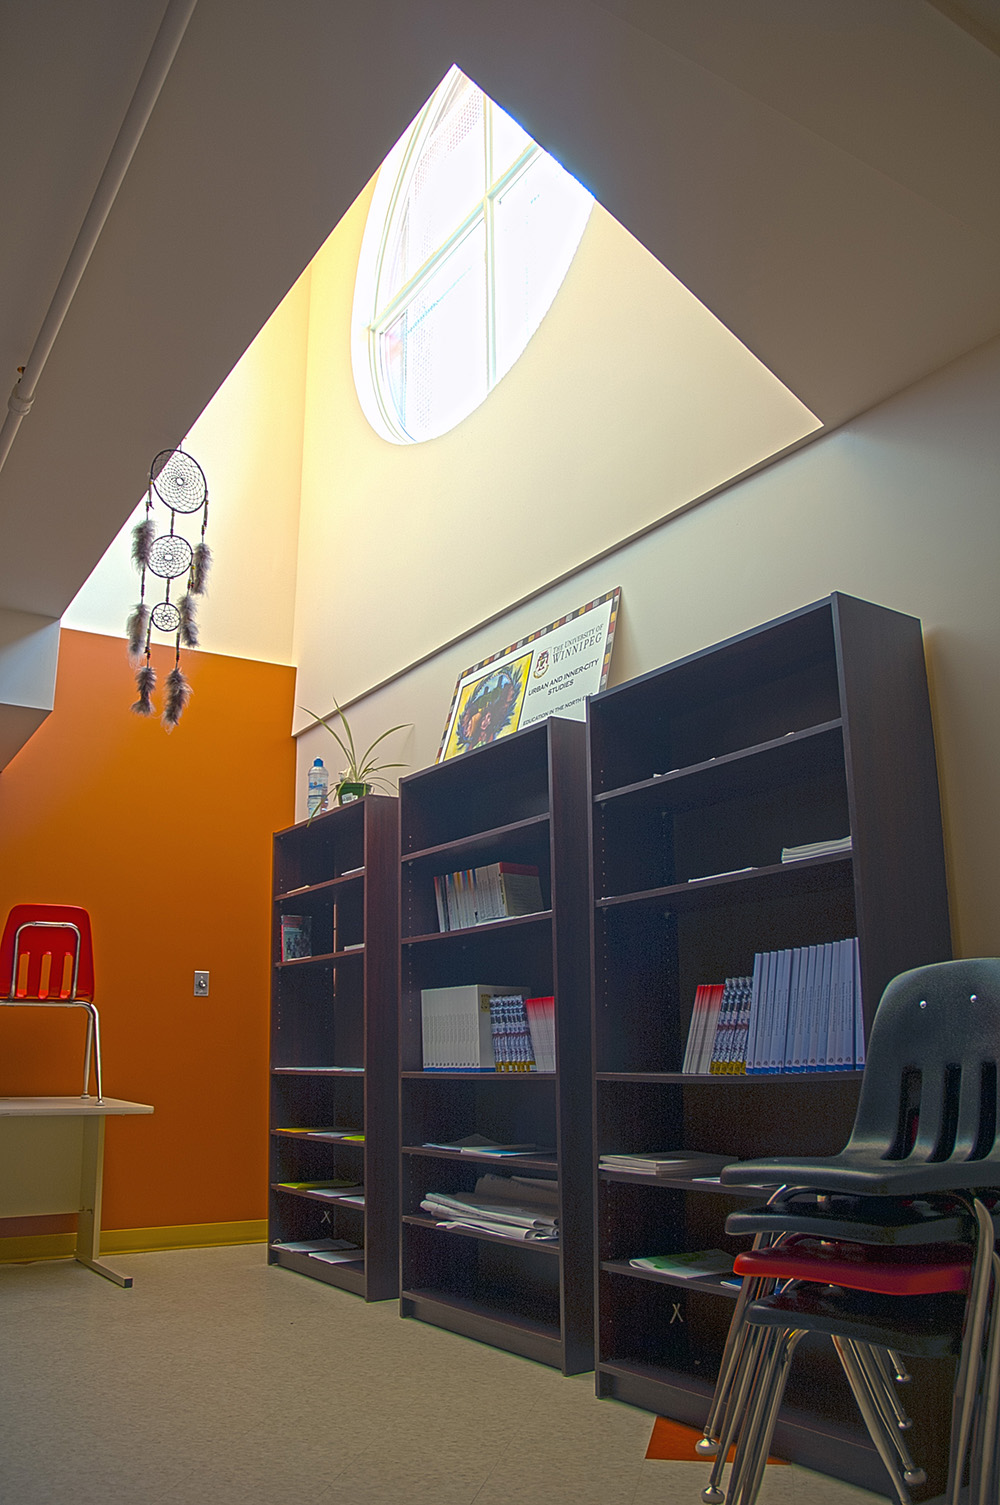 Makoonsag Daycare, interior photo of light wells / Photo: Derrick Finch